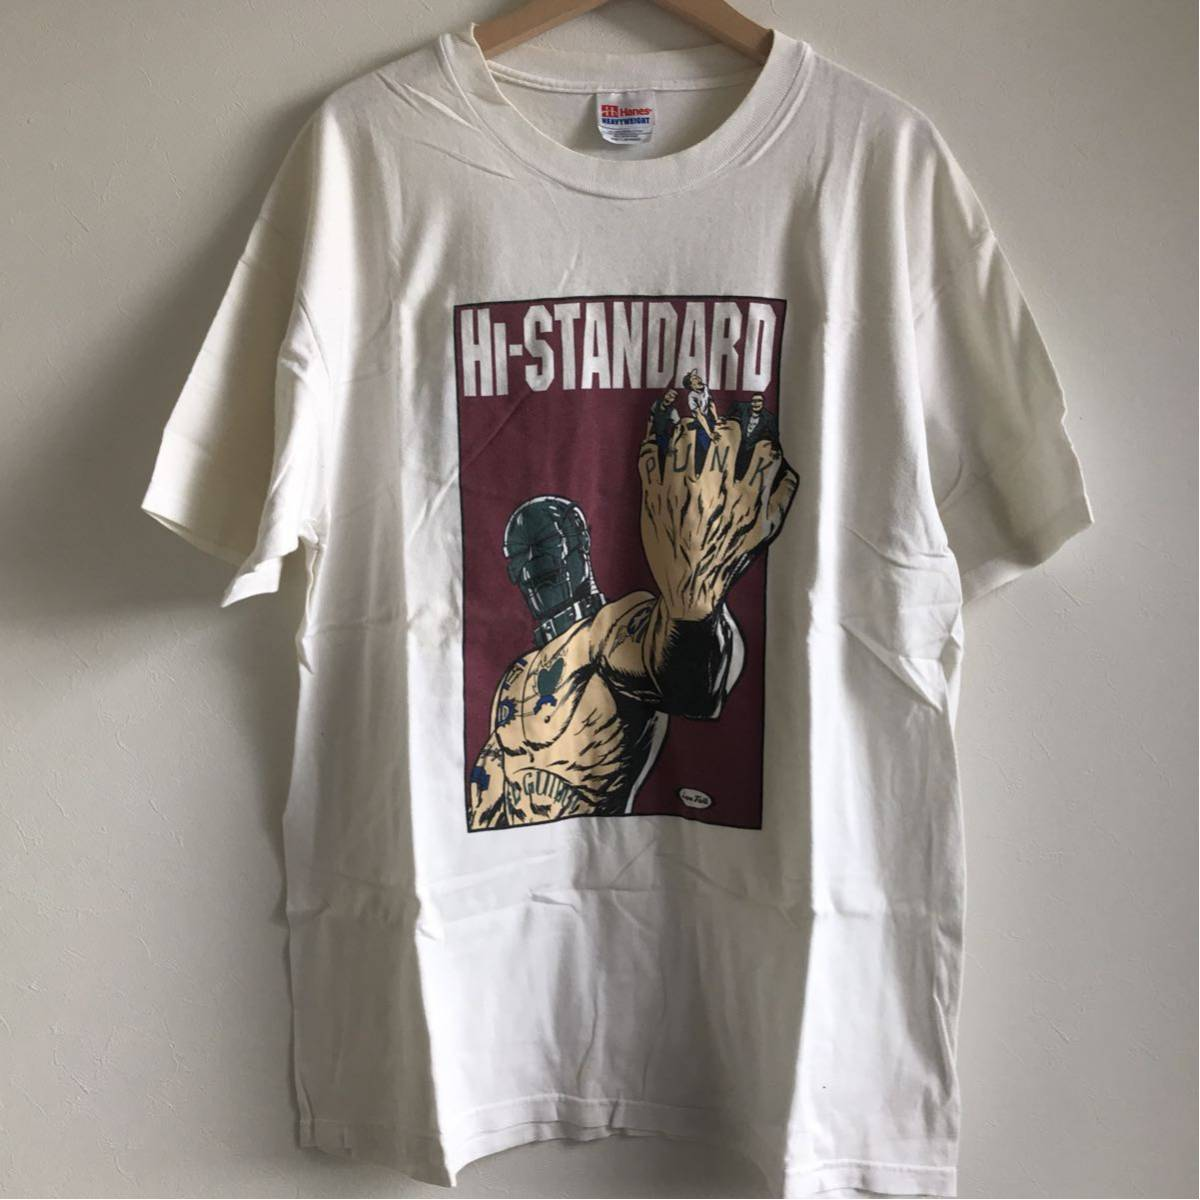 Hi-Standard ハイスタンダード Tシャツ ヴィンテージ (検索 FAT wreck chords )